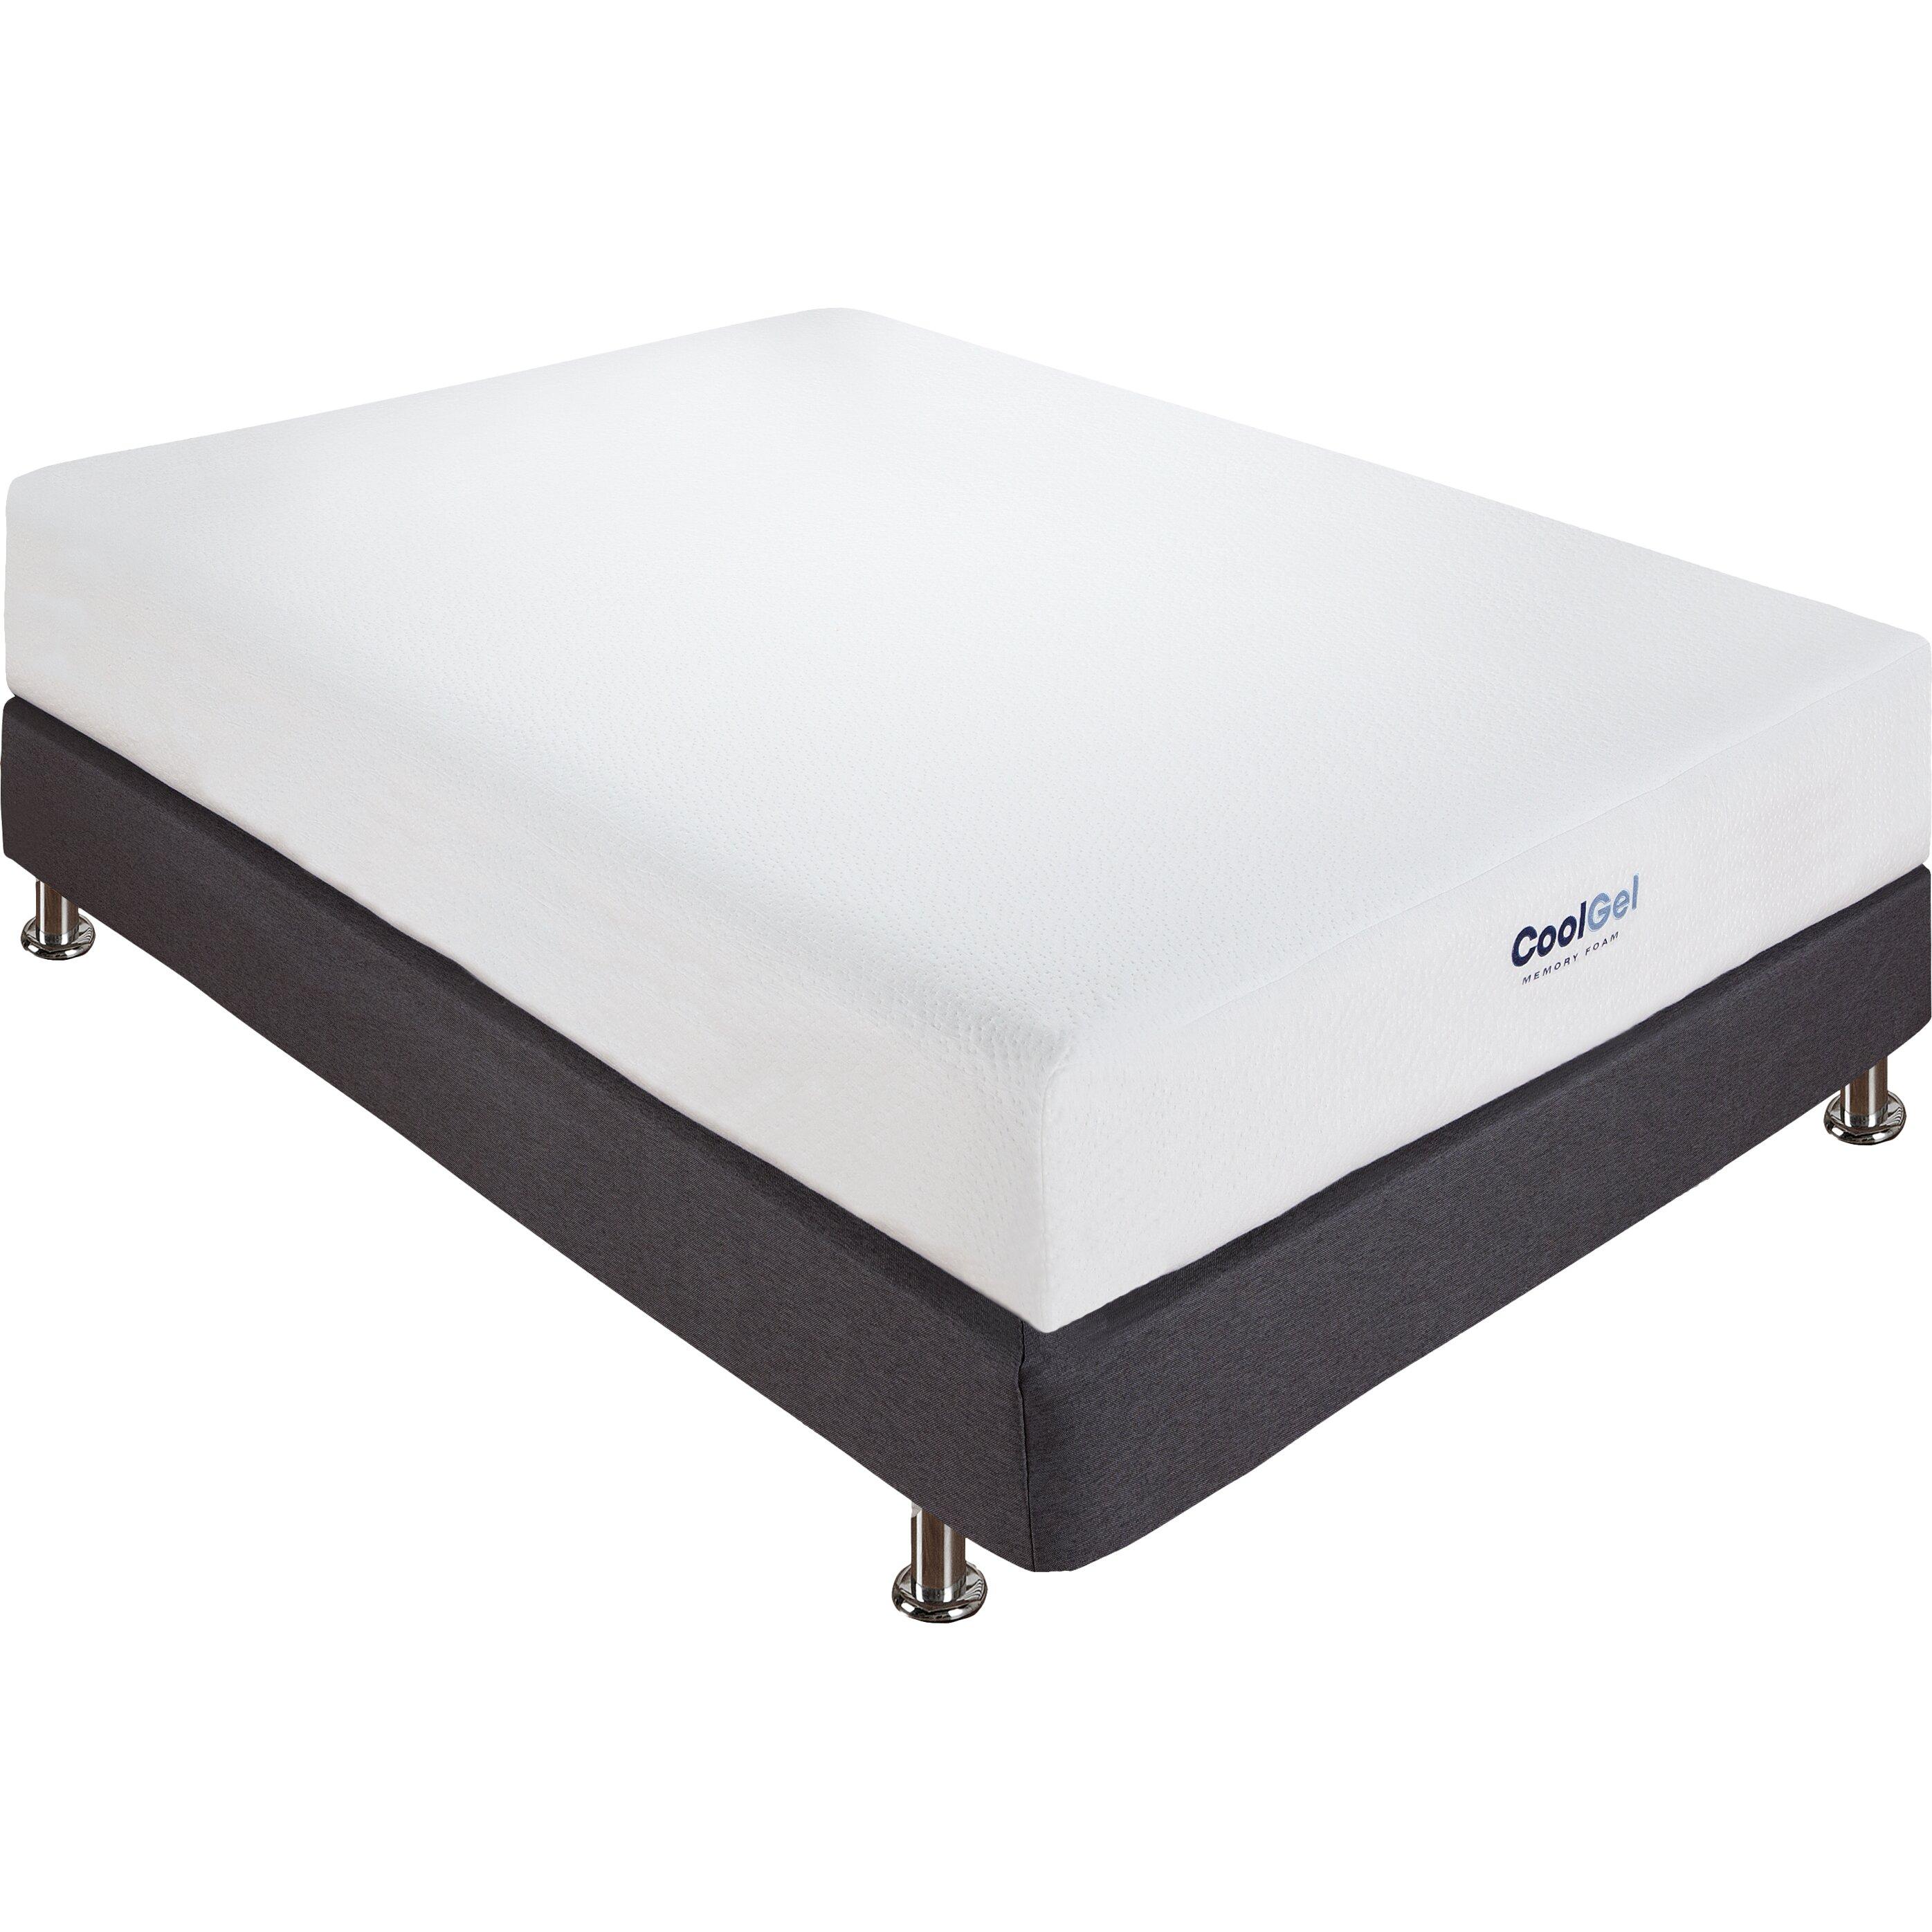 classic brands cool gel 8 gel memory foam mattress reviews wayfair. Black Bedroom Furniture Sets. Home Design Ideas